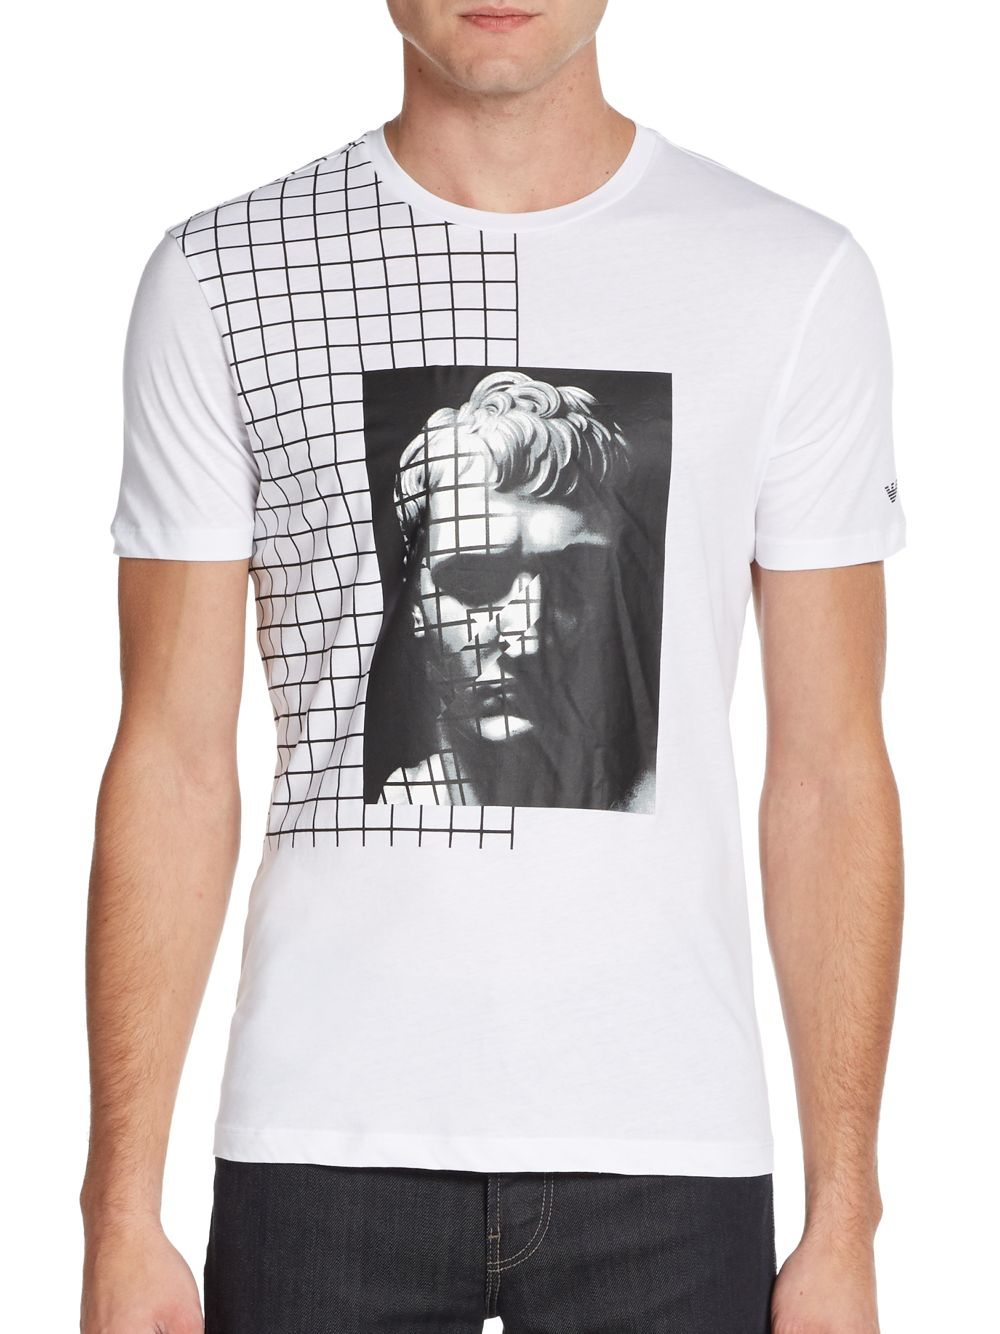 emporio armani cotton portrait graphic tee in white for men lyst. Black Bedroom Furniture Sets. Home Design Ideas